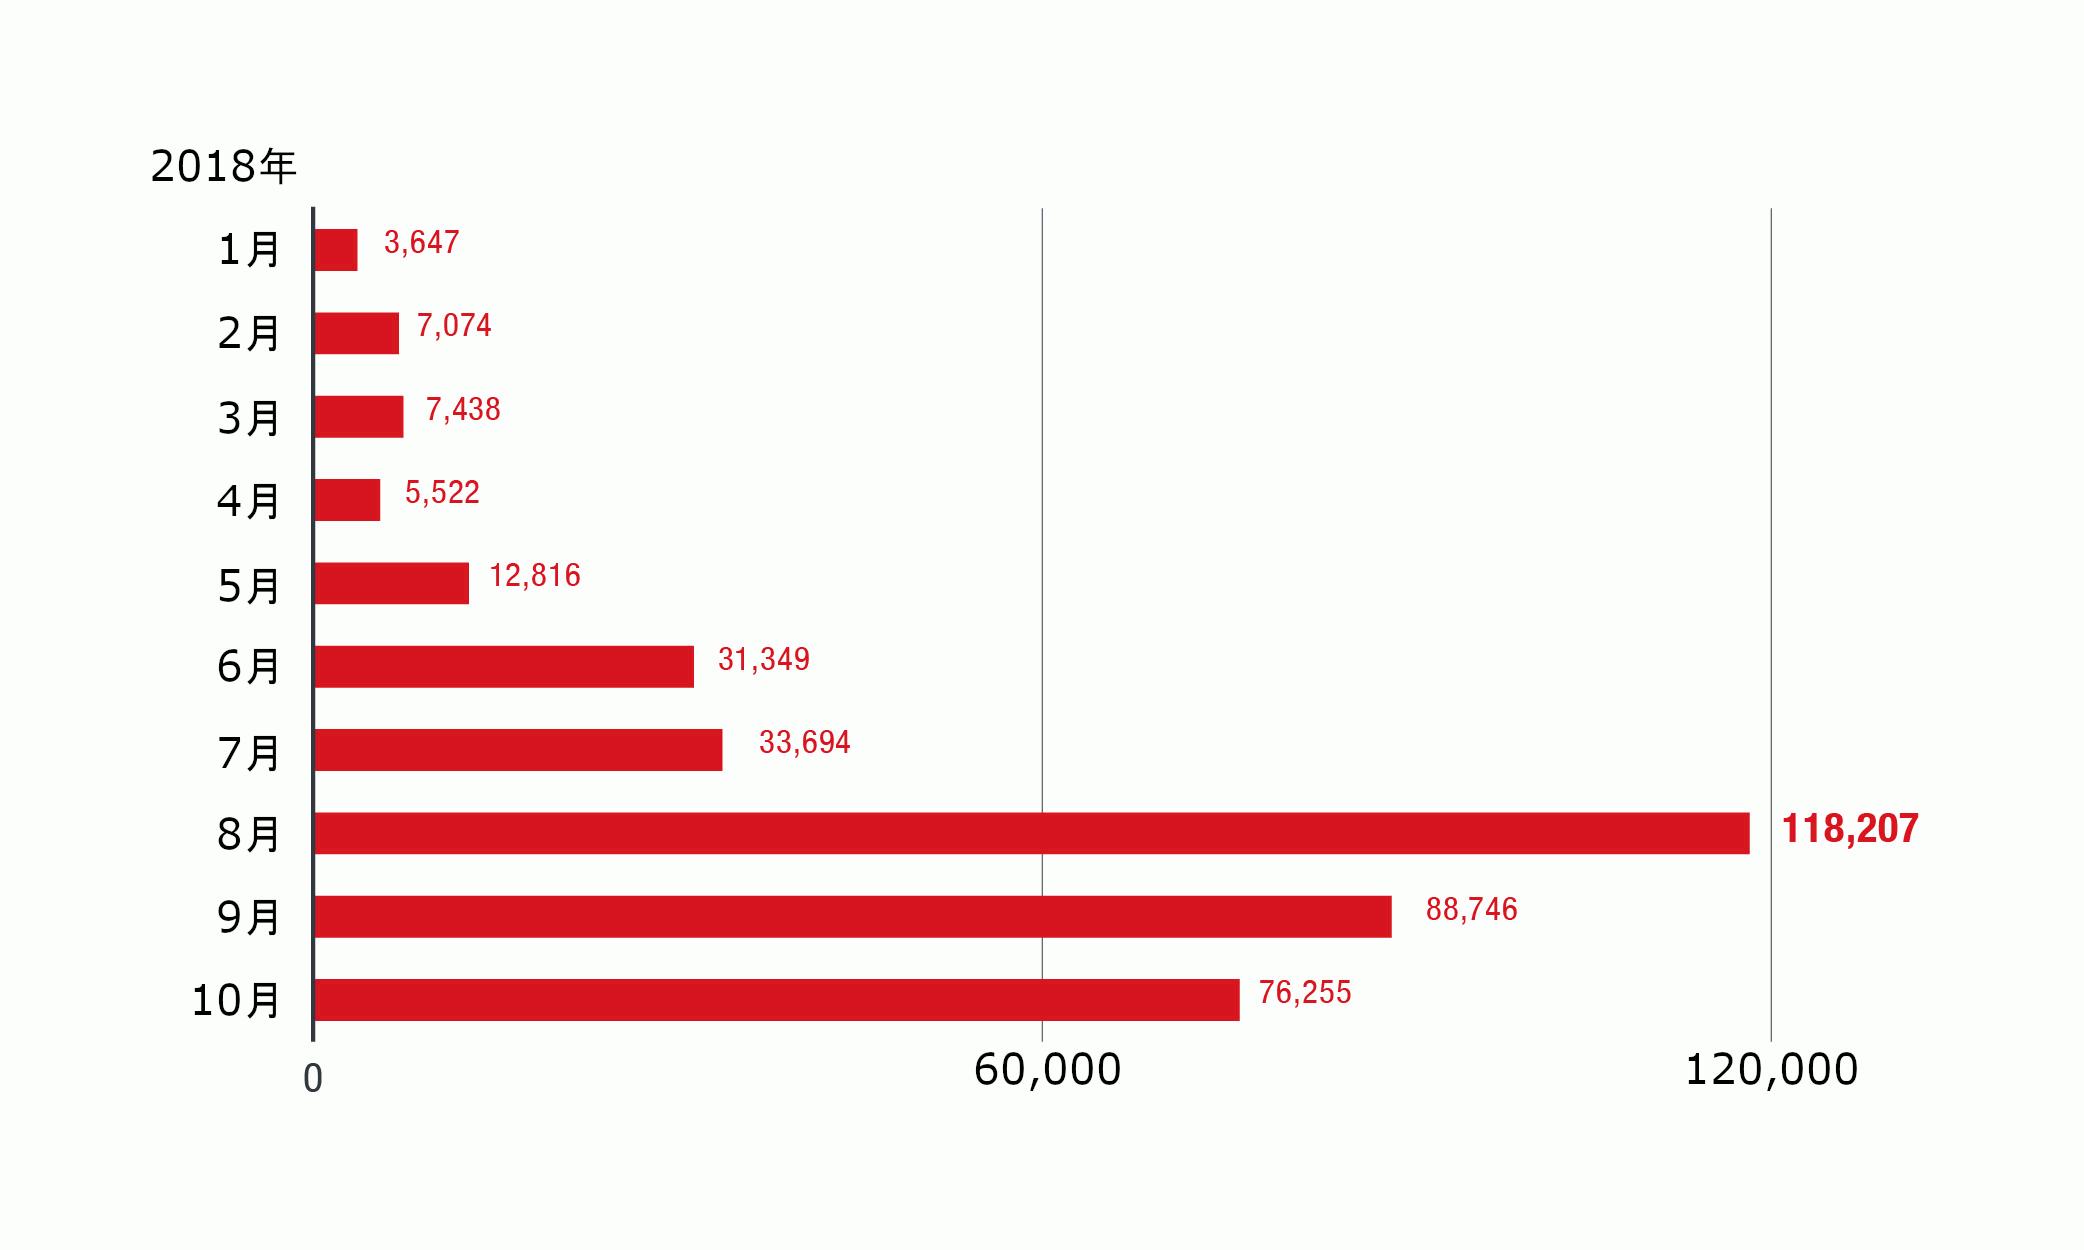 Android 端末向け不正アプリ「XLOADER」および「FAKESPY」の月別検出数